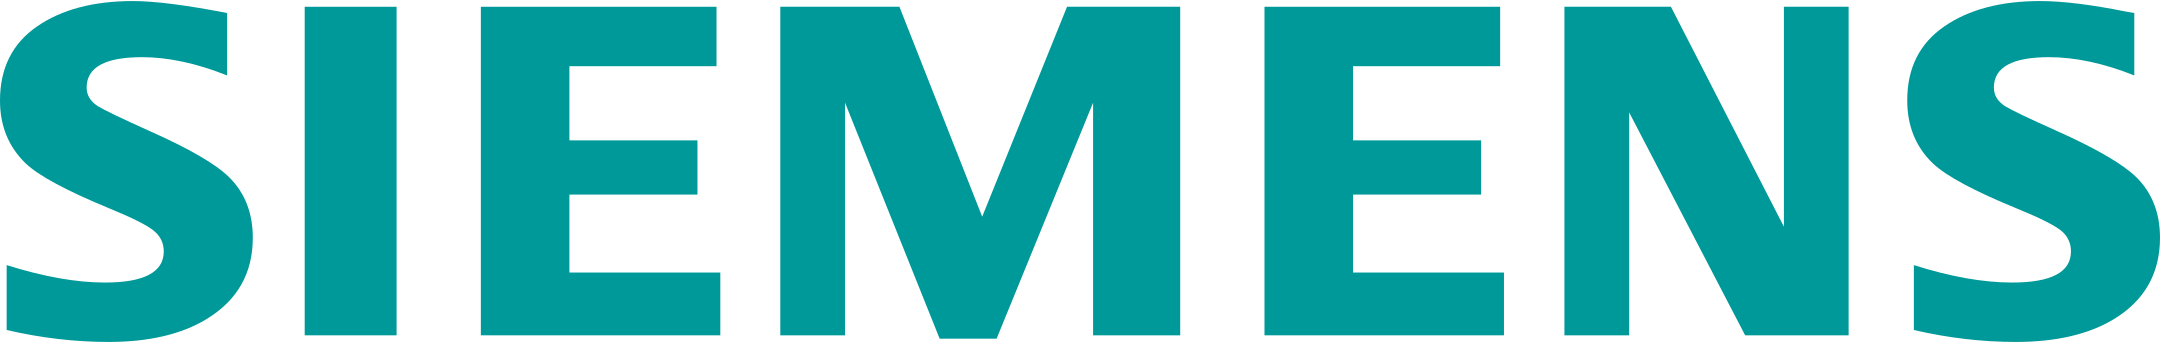 siemens logo 1 1 - Siemens Logo